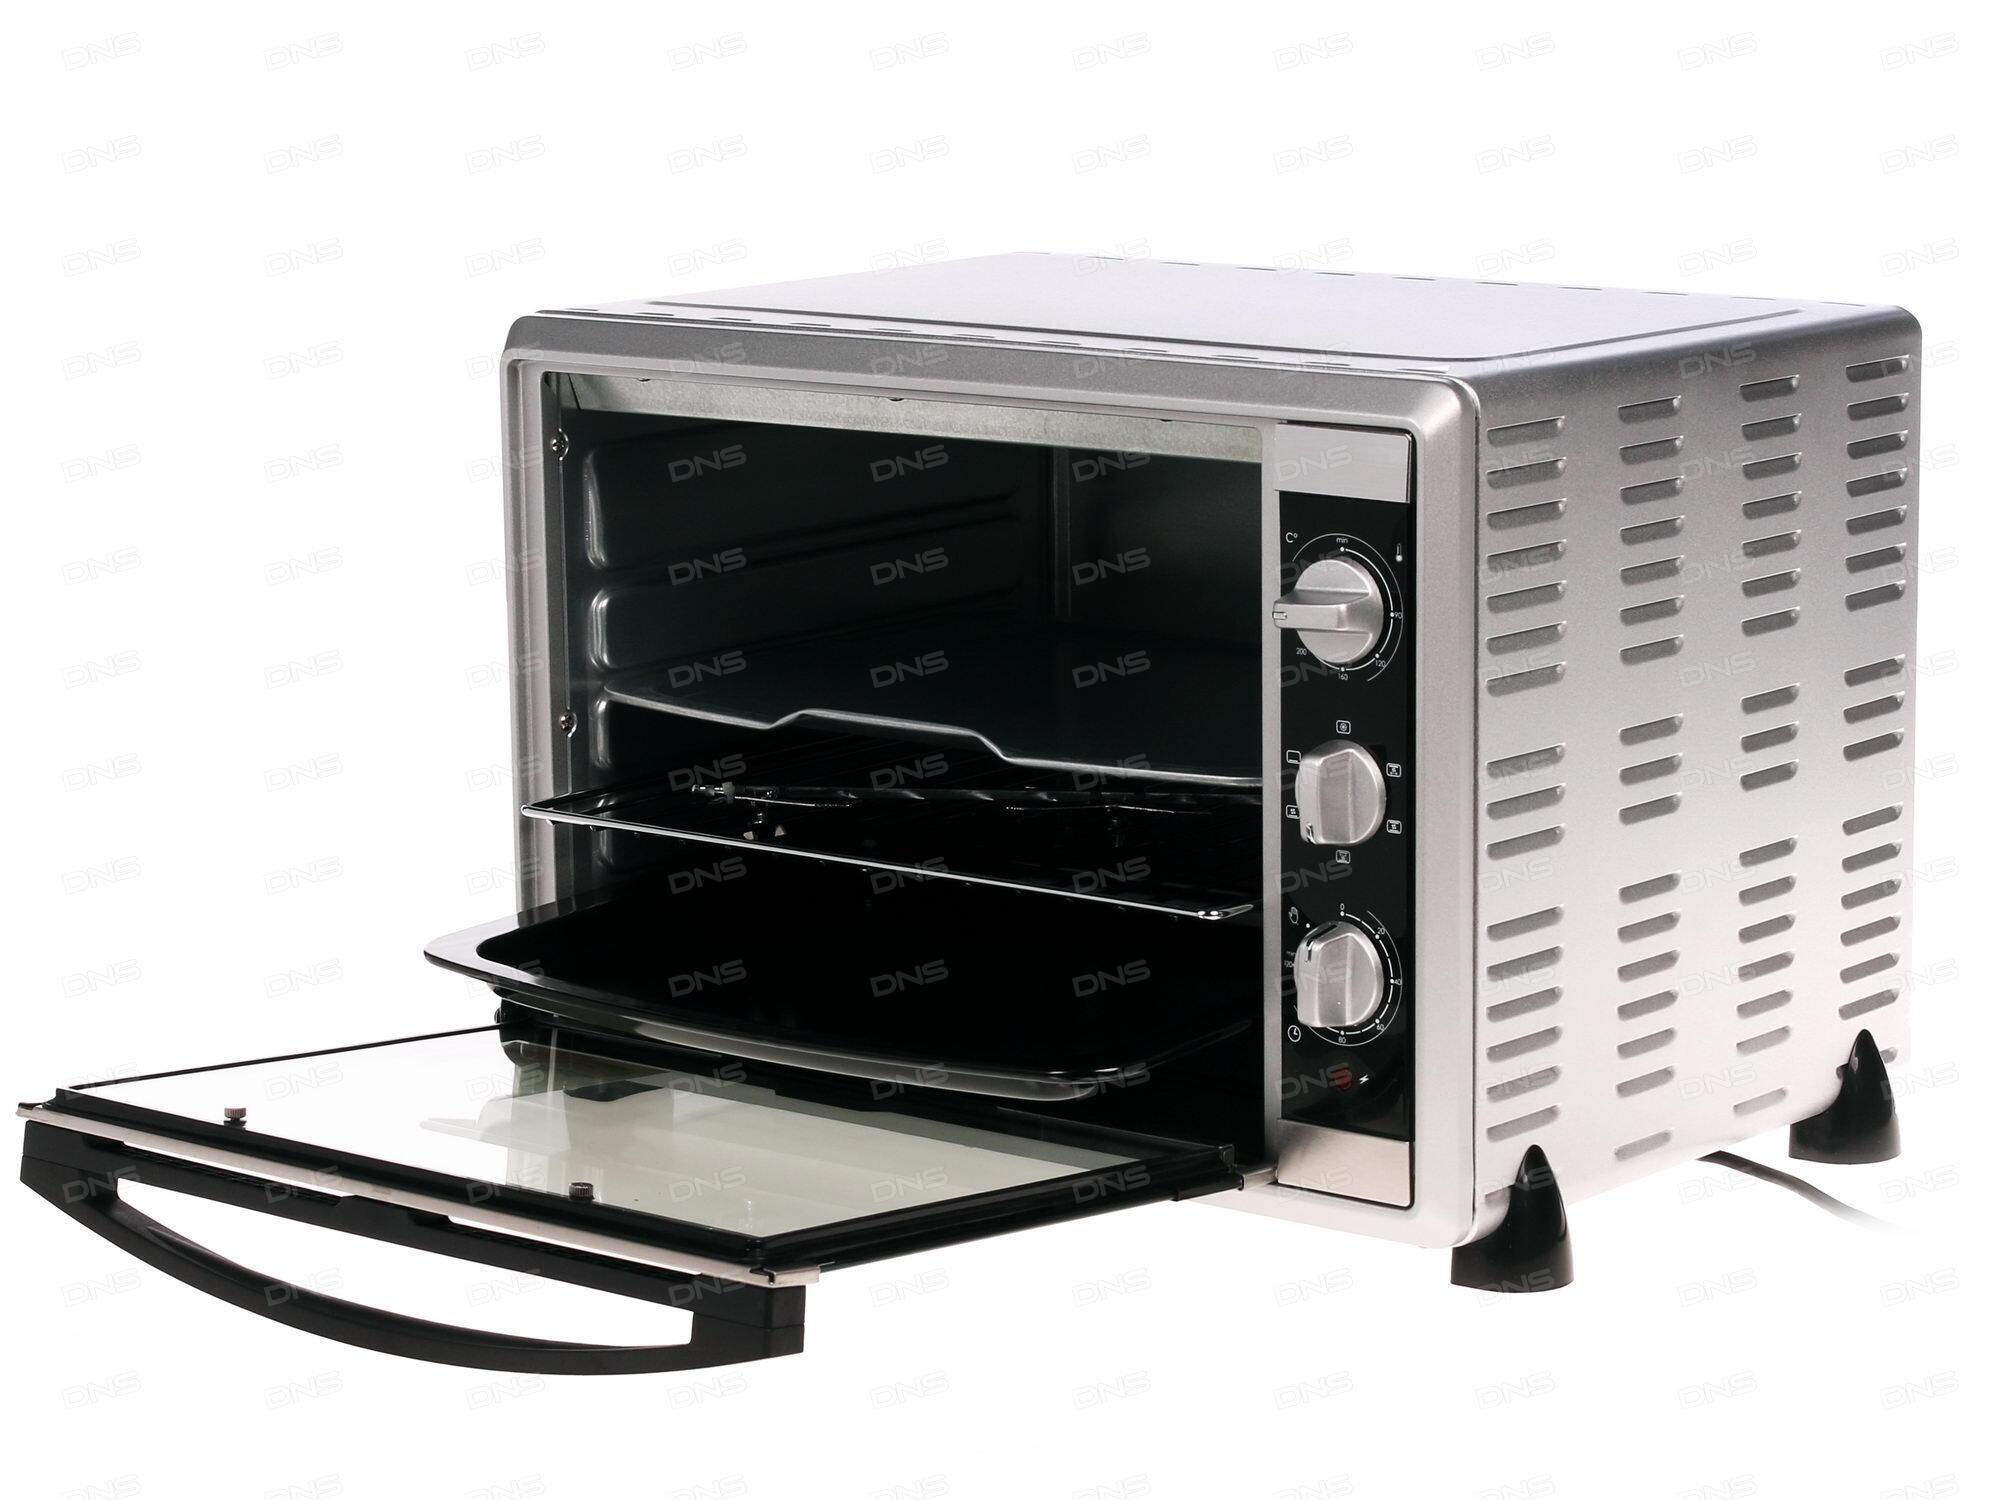 Ariete 976 bon cuisine for Ariete bon cuisine 520